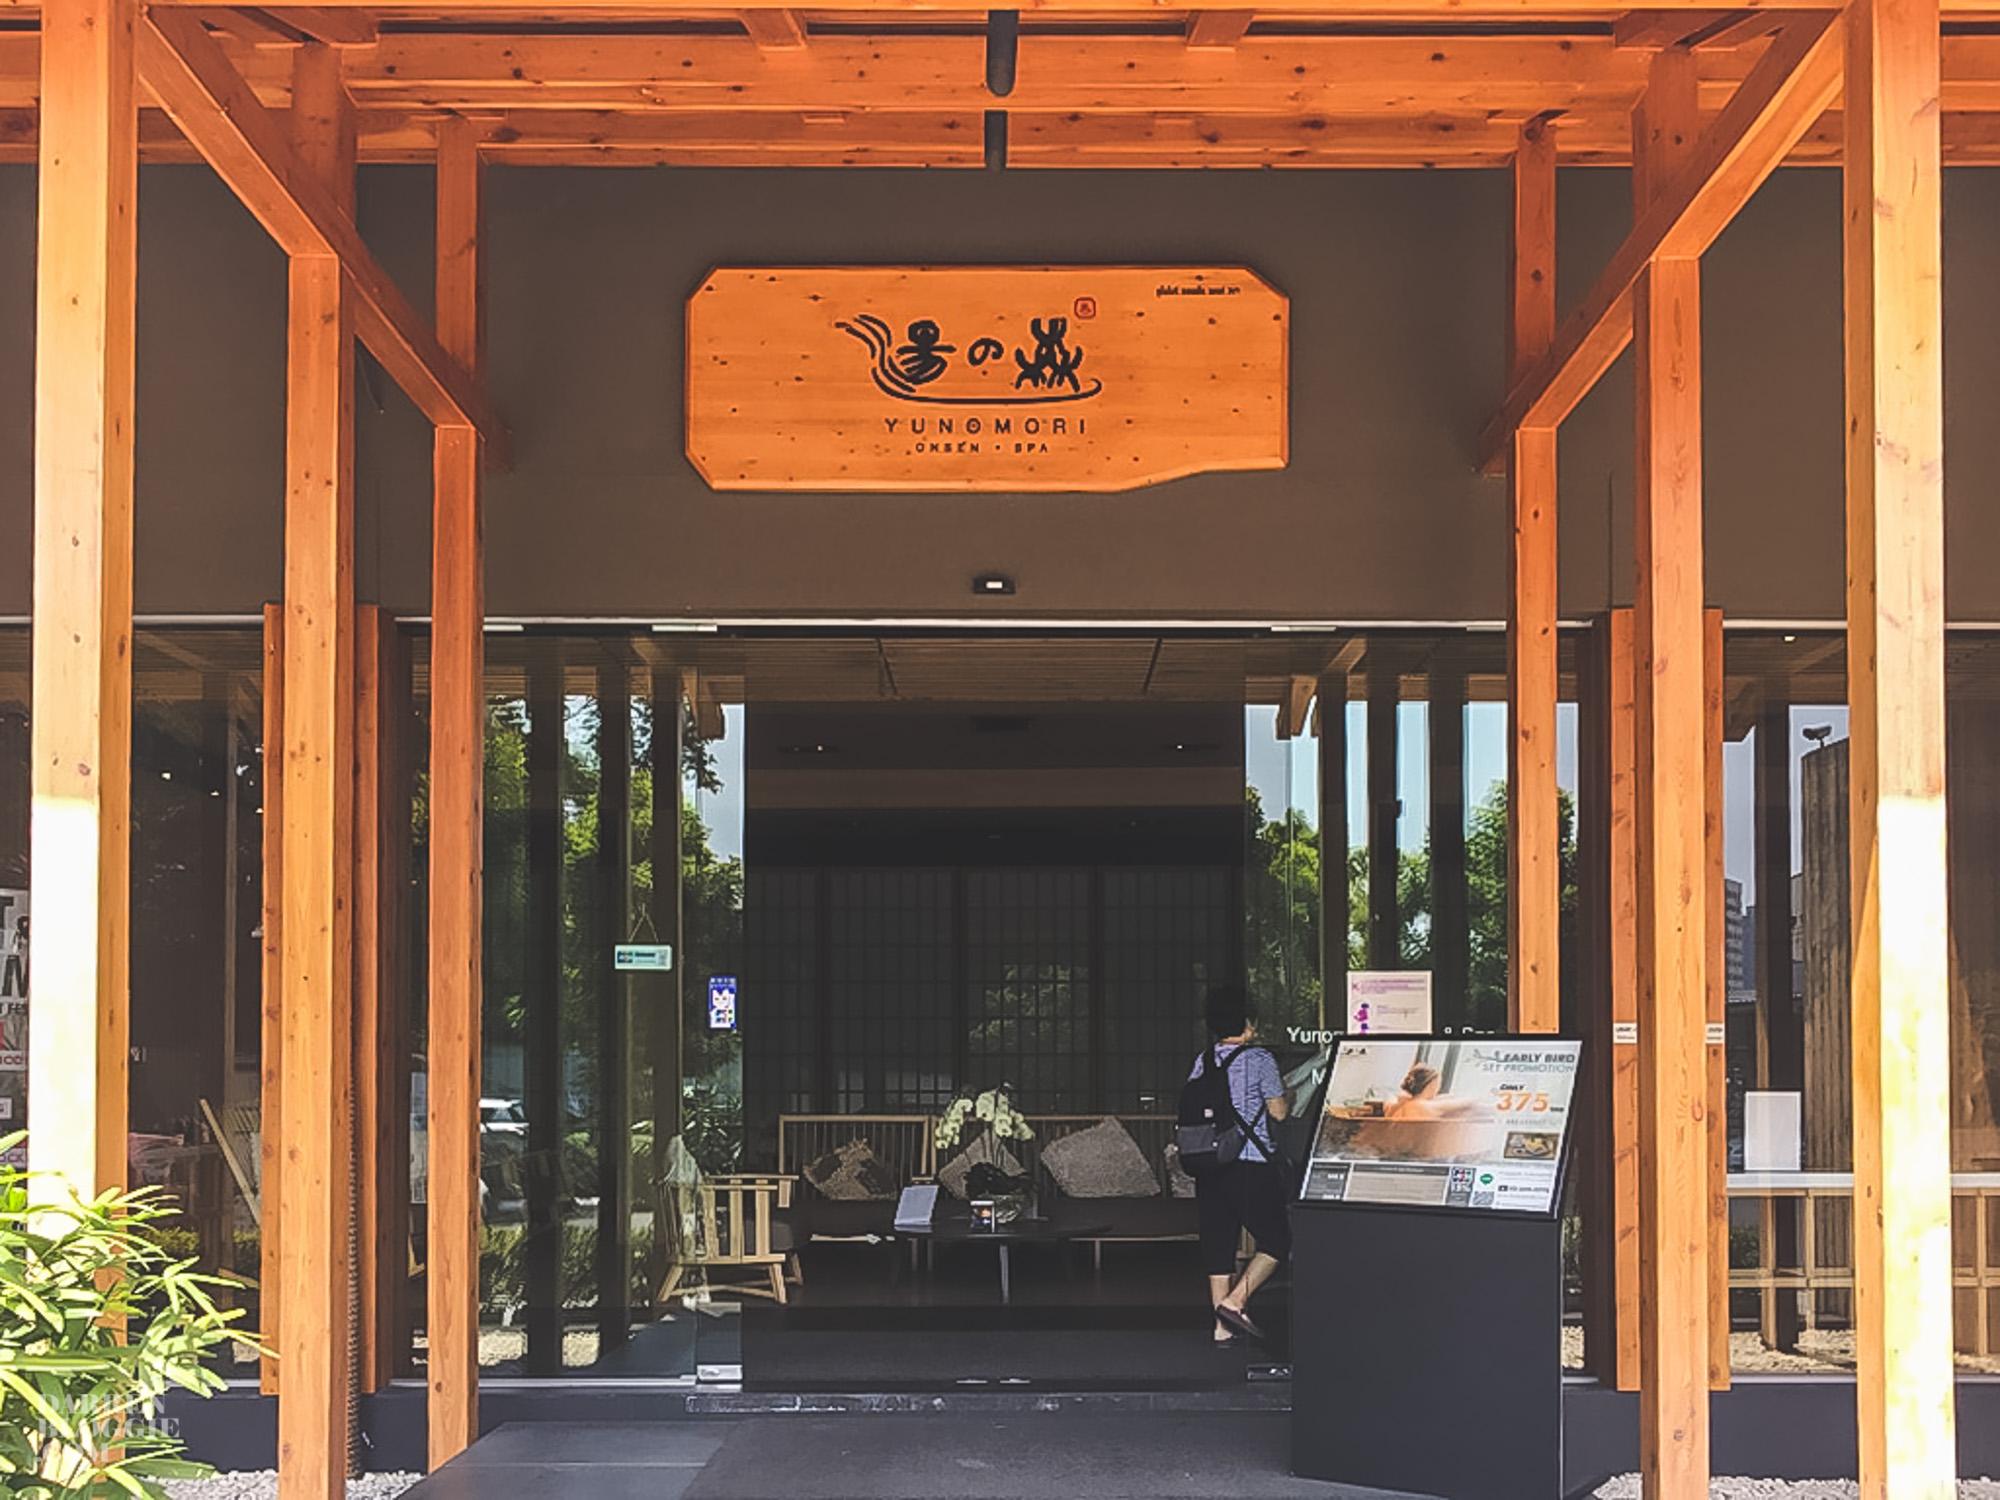 Yunomori-Onsen-Spa-Bangkok-thailand-3